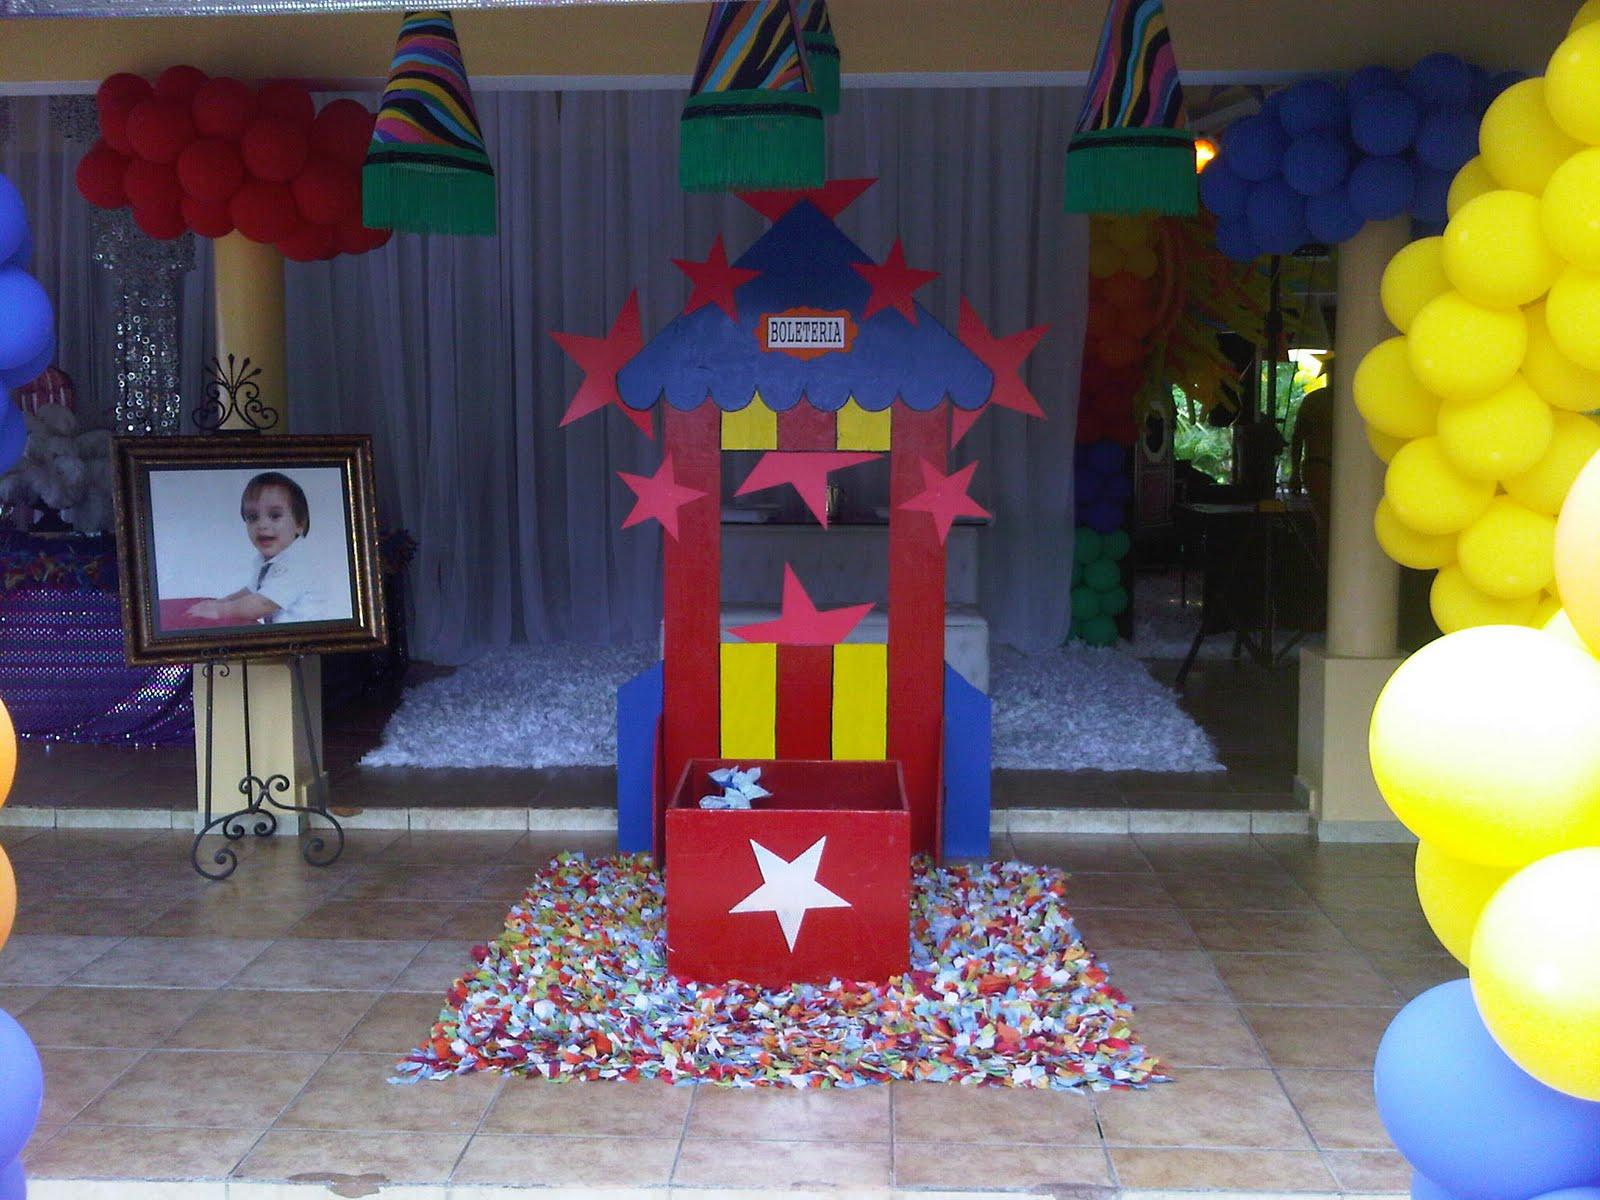 Mauricio events cumplea os infantil decoraci n estilo circo - Decoracion de cumpleanos infantiles ...